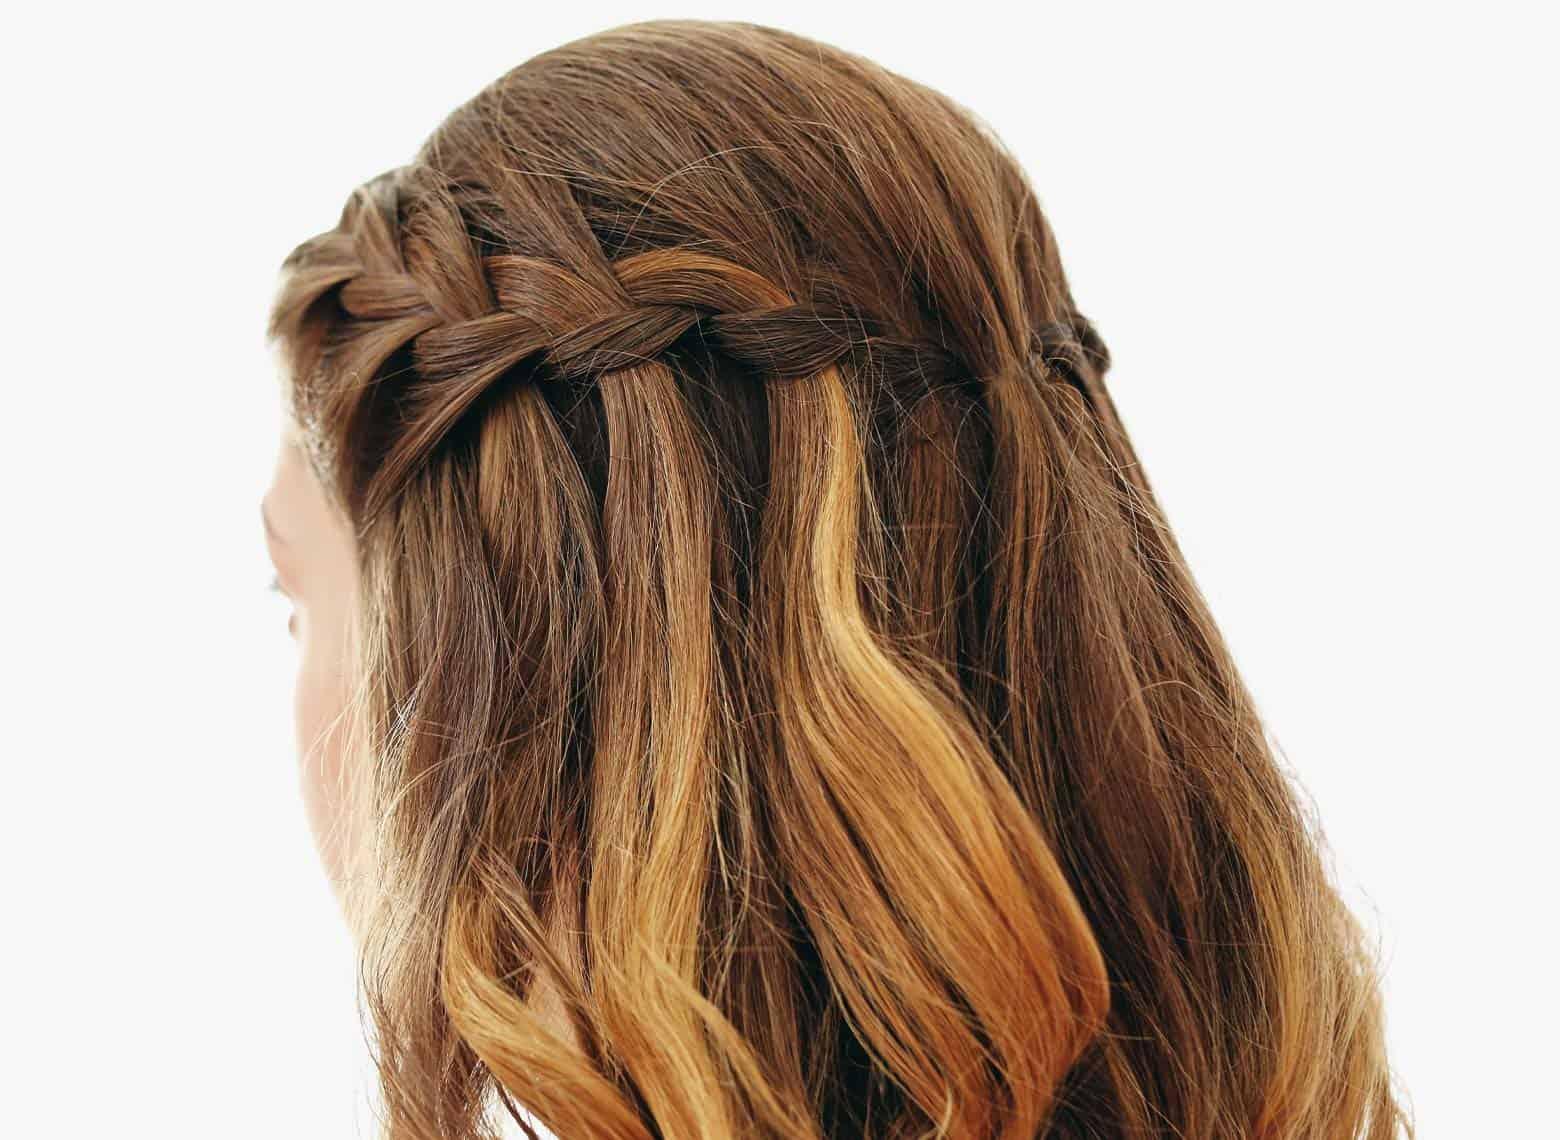 woman with waterfall braid